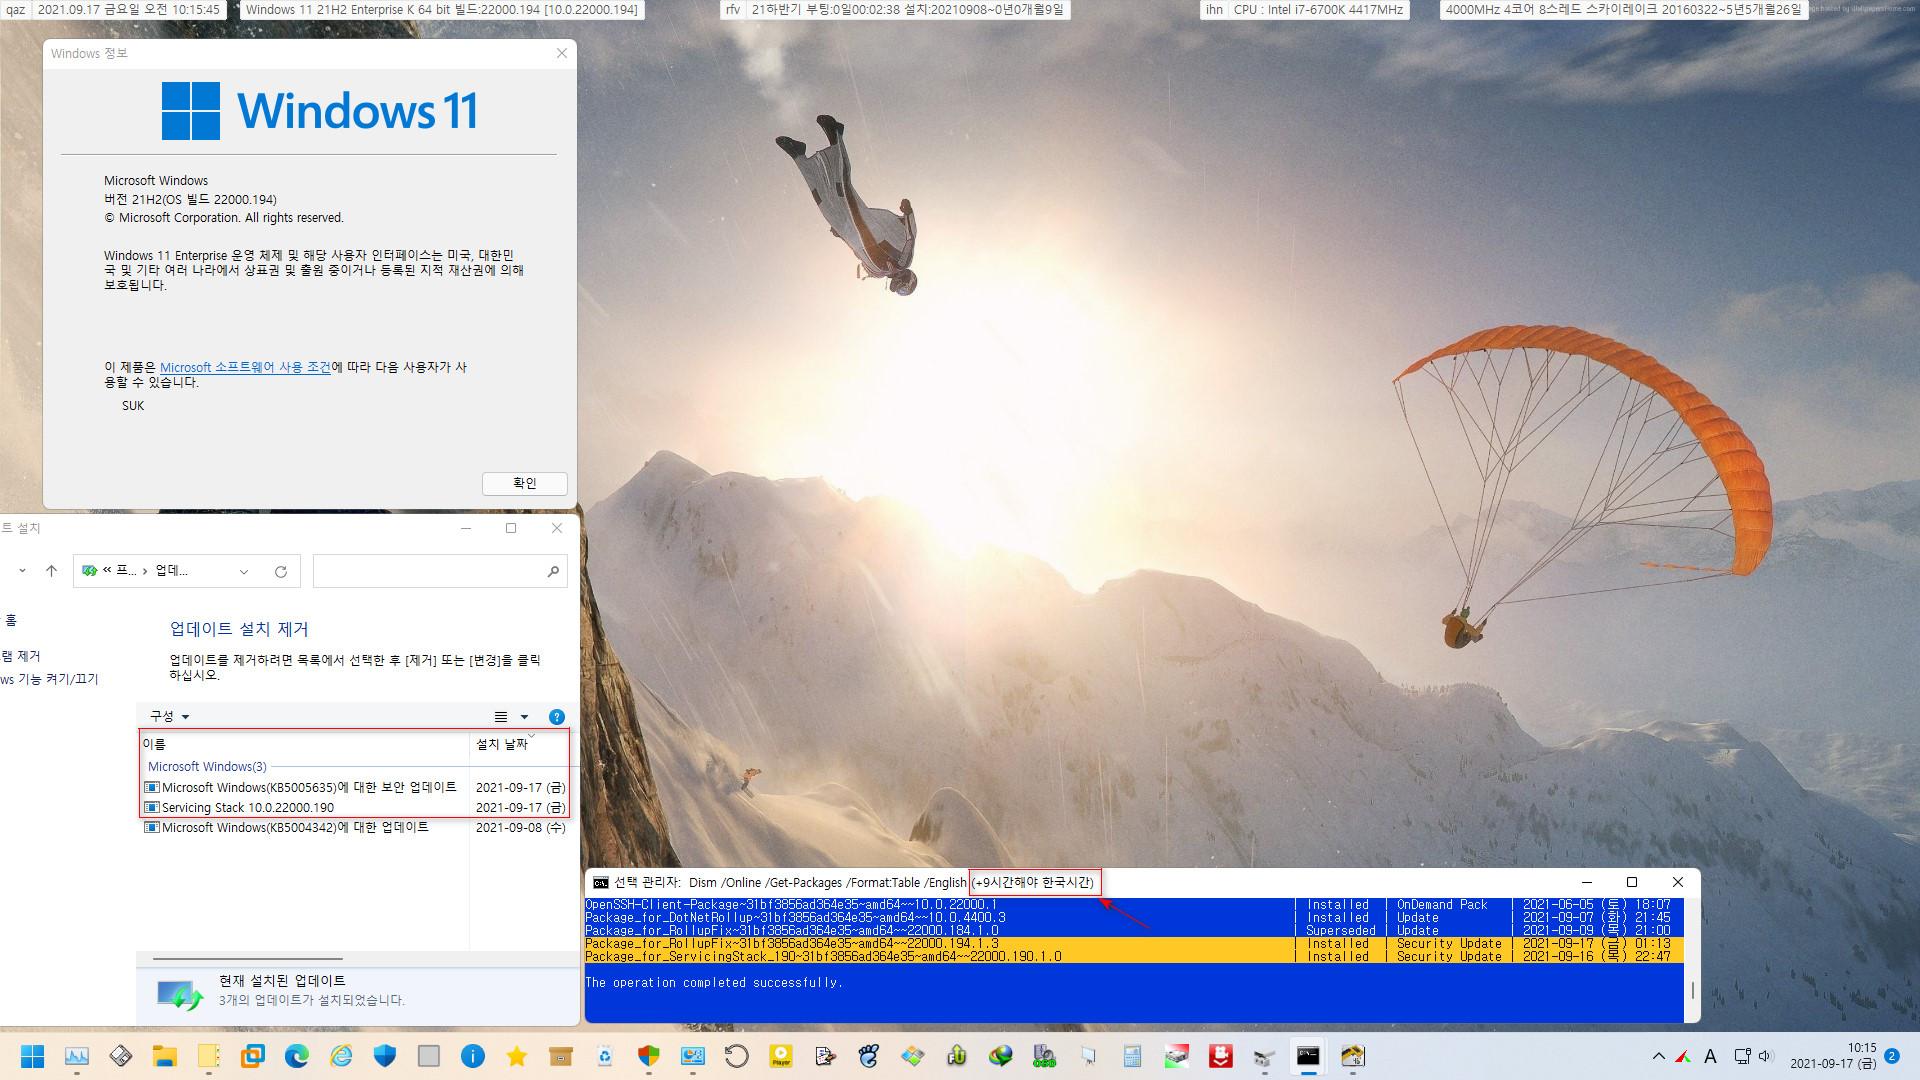 Windows 11 인사이더 프리뷰 - 버전 21H2 (OS 빌드 22000.194) 나왔네요 - 베타 채널 + 릴리스 프리뷰 채널 - 누적 업데이트가 설치되지 않아서 여러가지 시도하다가 dism 복원이 효과가 있었는지 설치 성공하긴 했습니다 2021-09-17_101546.jpg